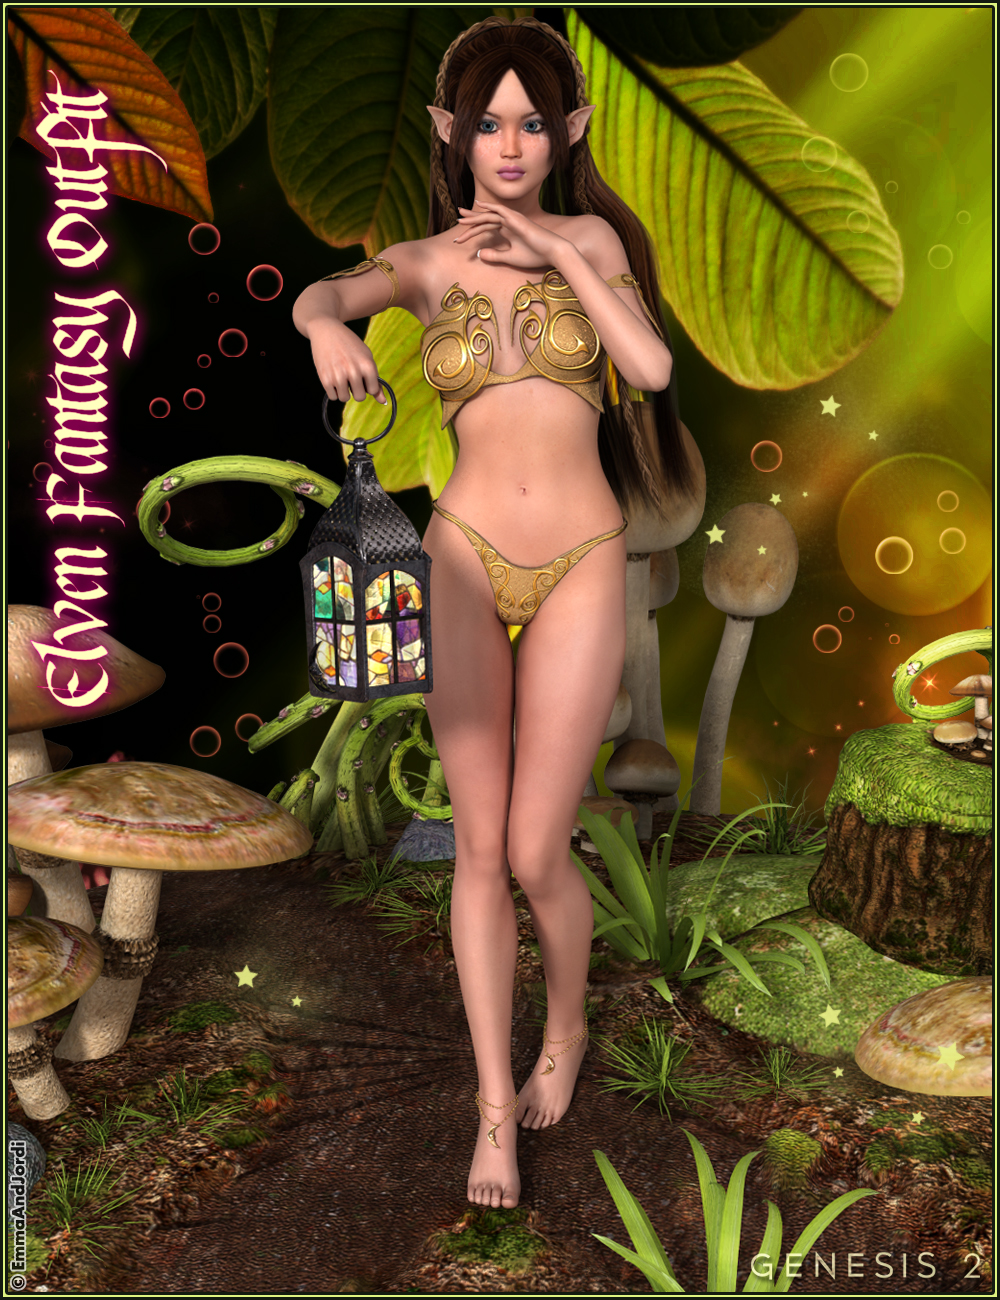 Elven Fantasy Outfit for Genesis 2 Female(s) by: EmmaAndJordi, 3D Models by Daz 3D